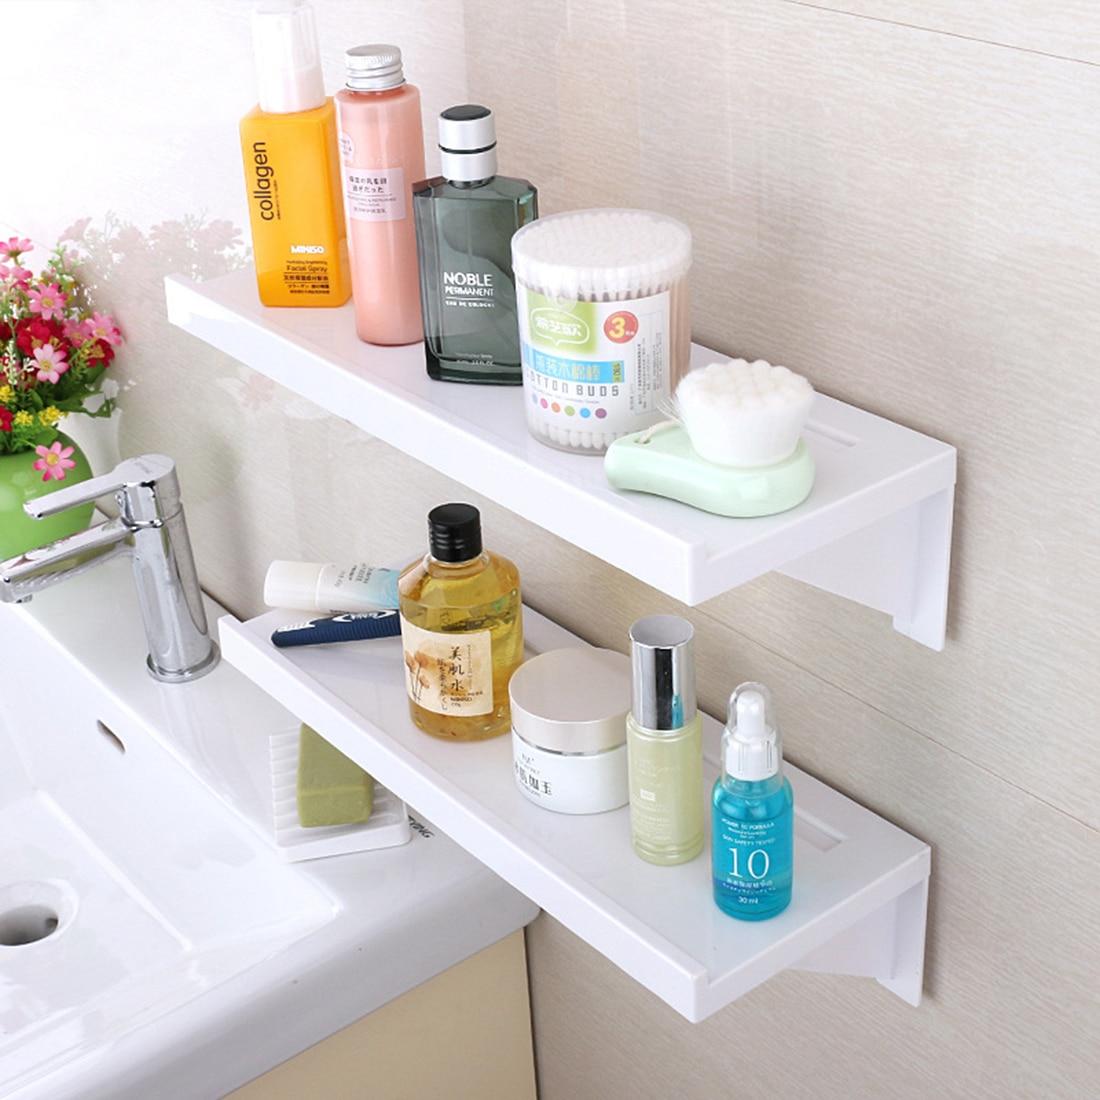 HIPSTEEN Adhesive Storage Rack Wall Shelf Sundries Holder Bathroom Organizer Hooks On The Wall Non trace Stick Type White